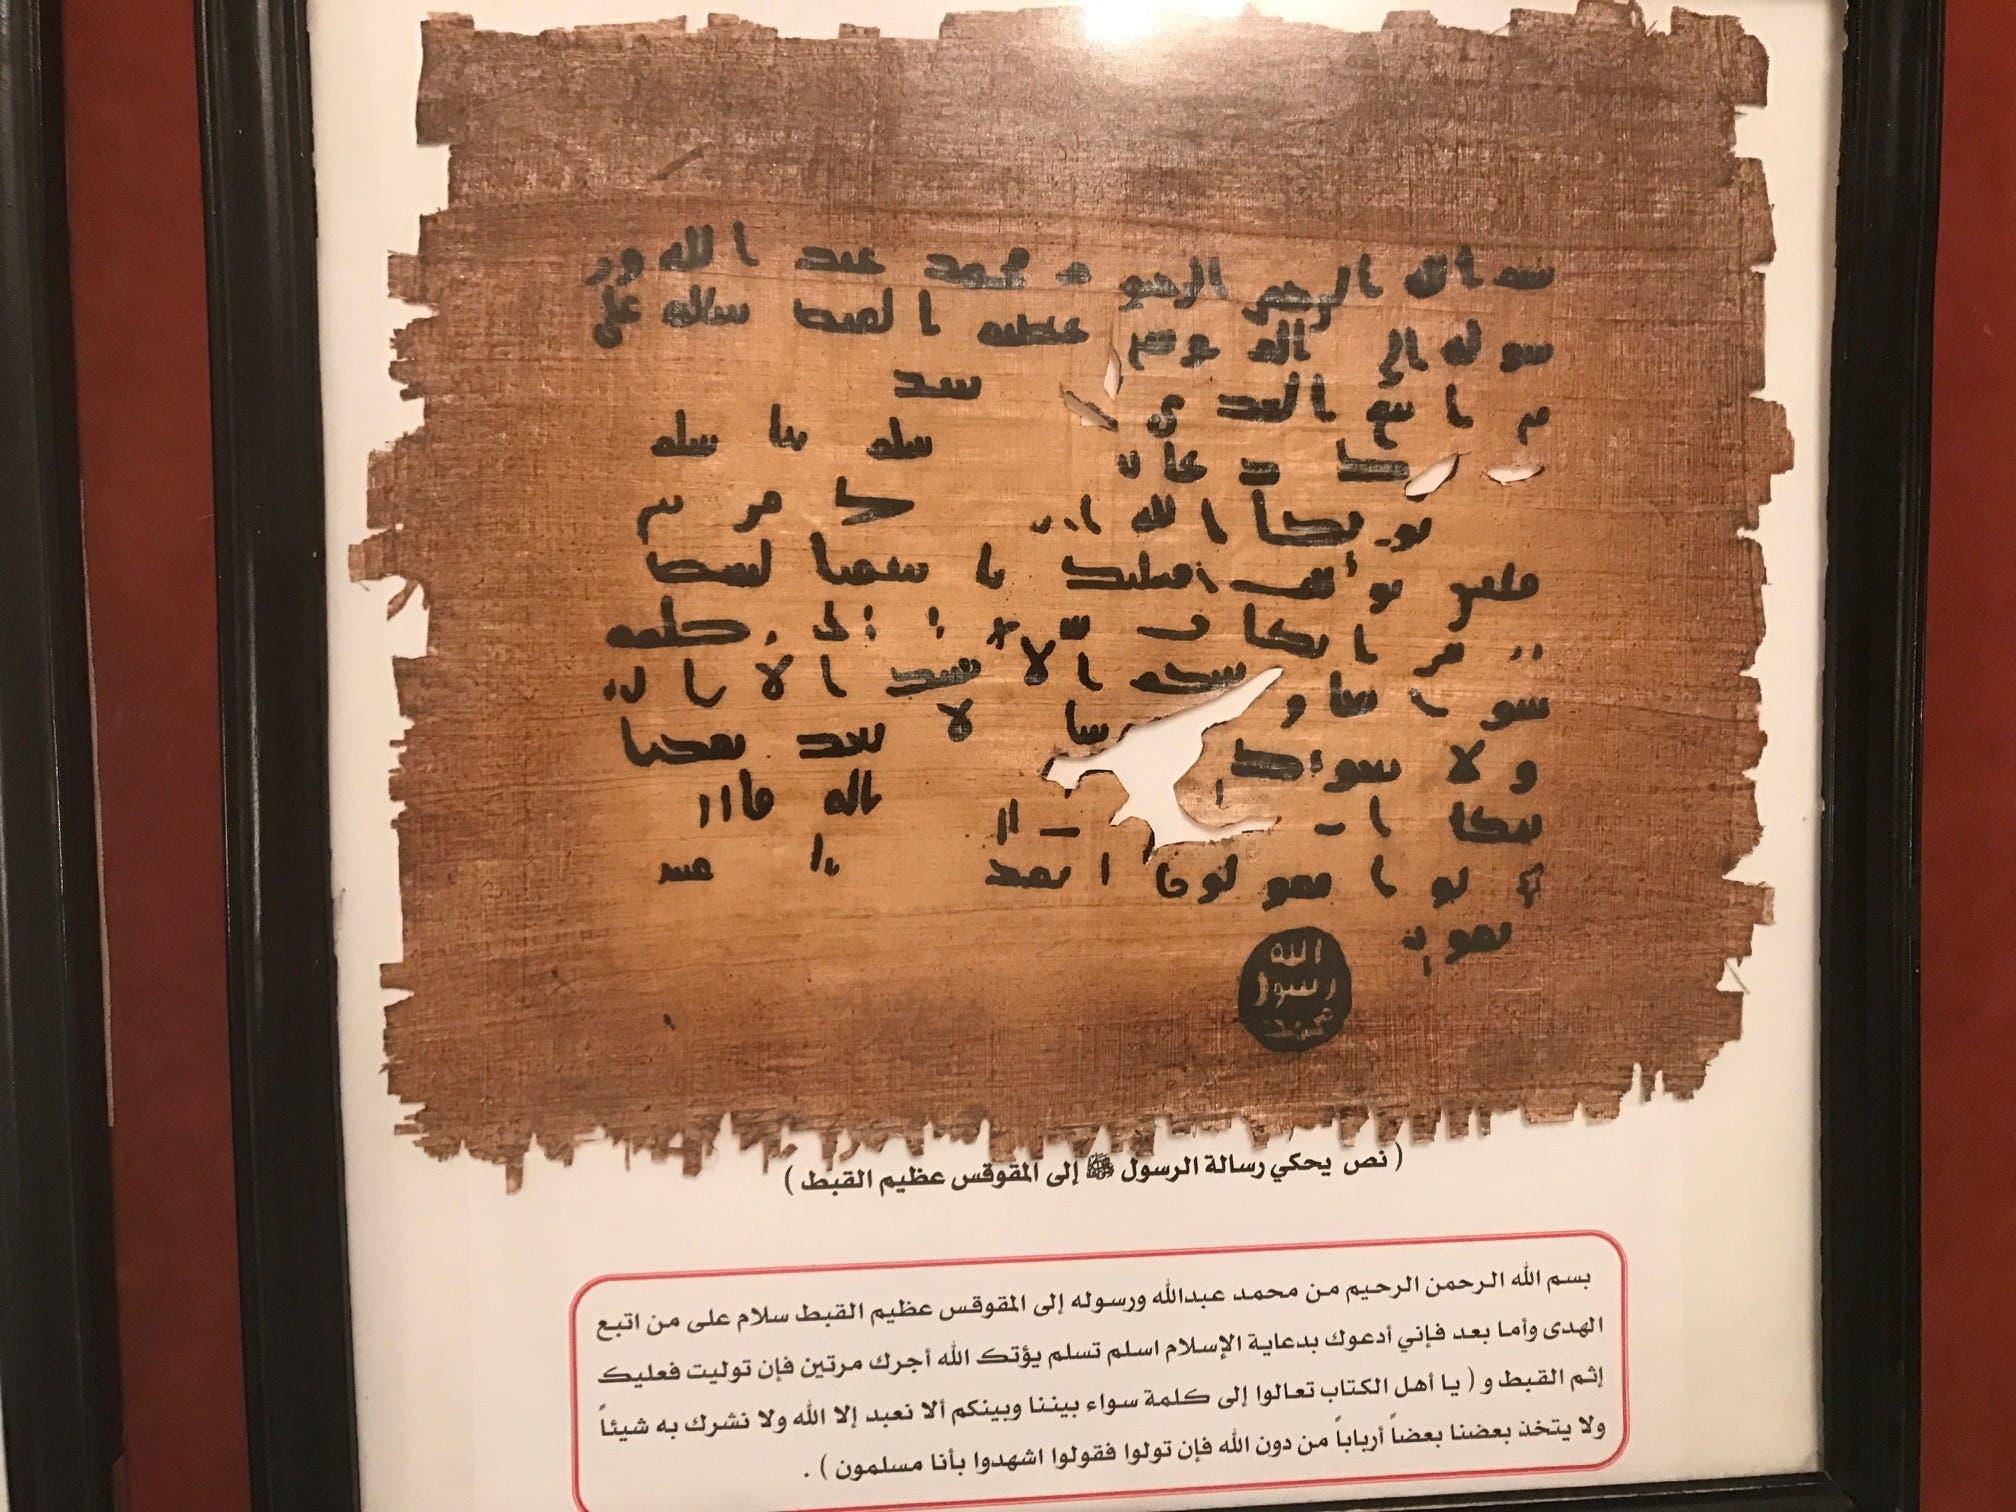 بالصور.. رسائل النبي محمد ملوك 83306306-ab77-4c9c-a